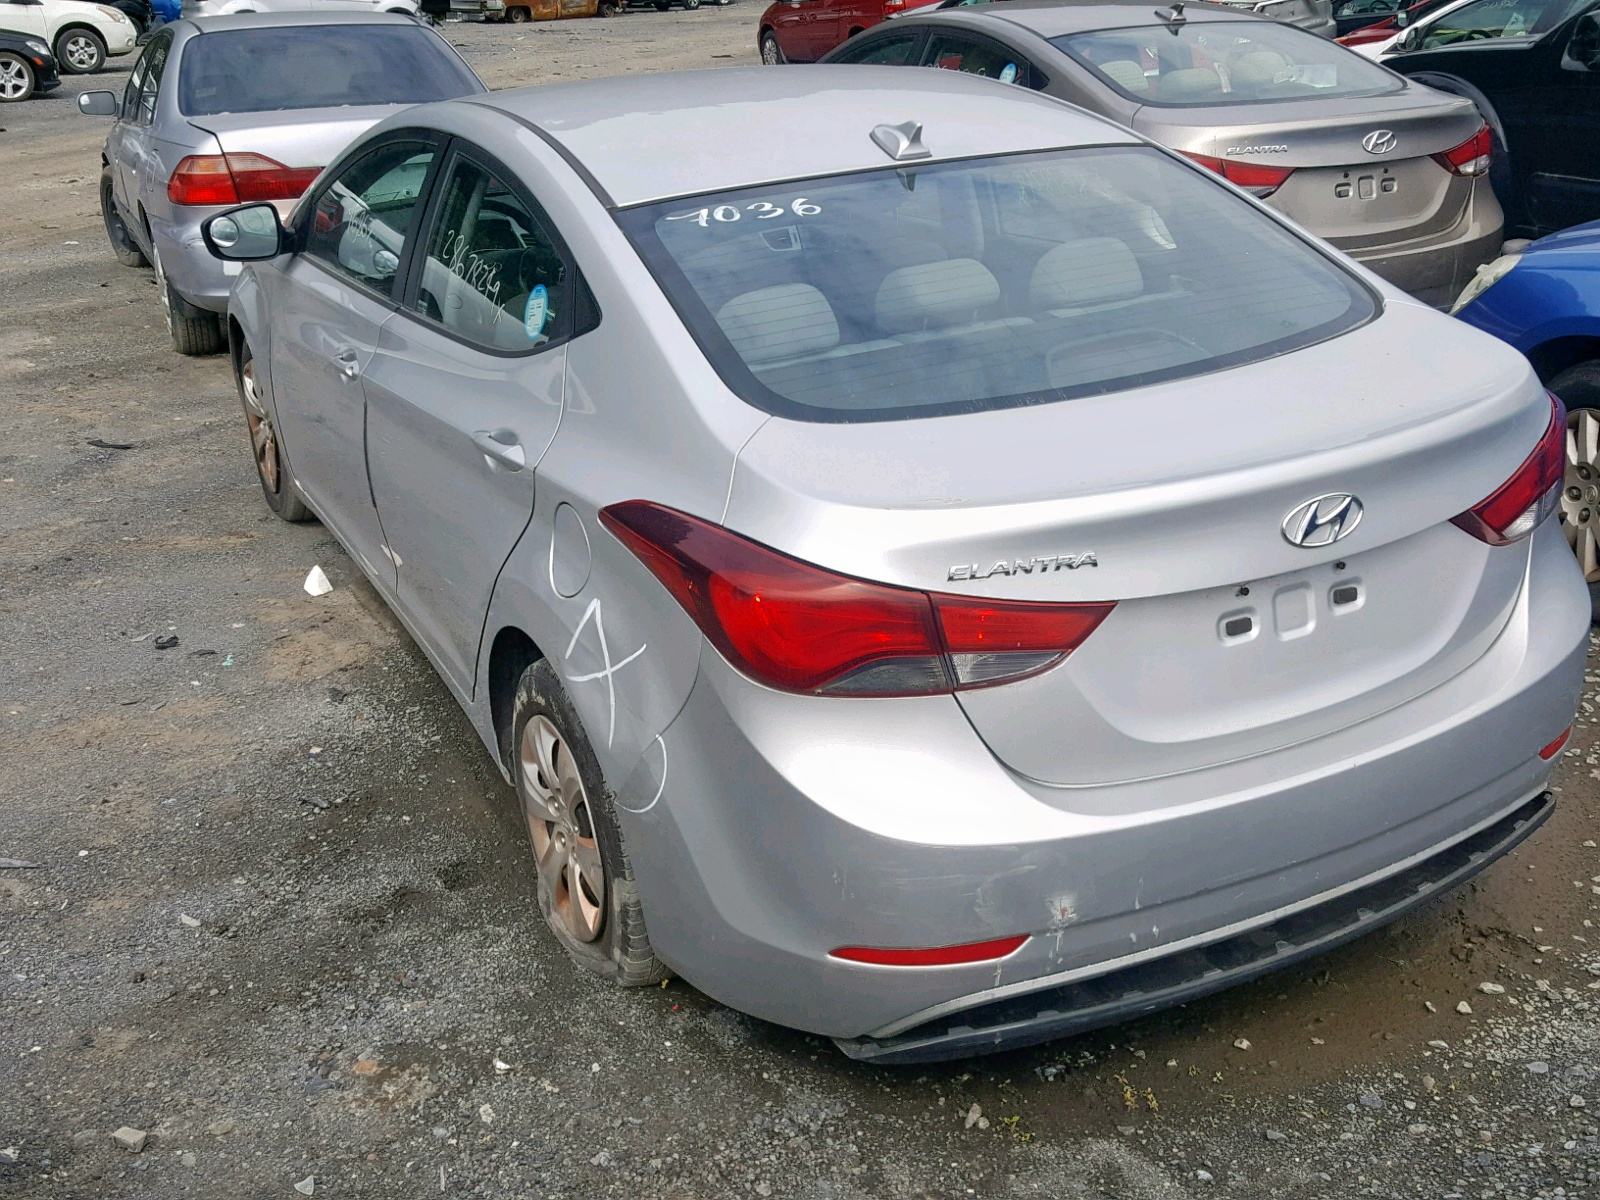 5NPDH4AE0GH703333 - 2016 Hyundai Elantra Se 1.8L [Angle] View